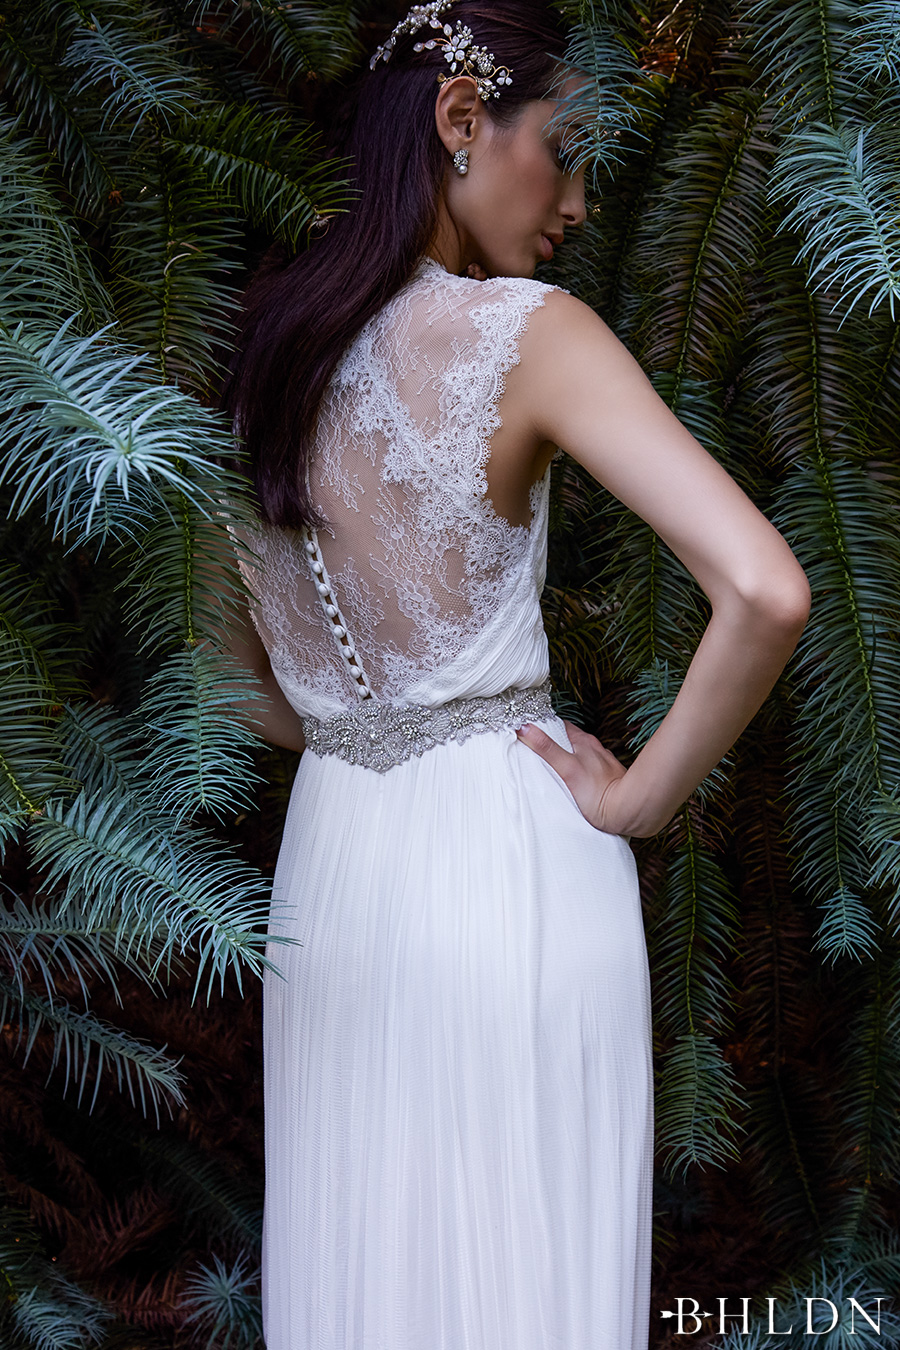 Fantasia Wedding Dresses 10 Best bhldn fall bridal sleeveless